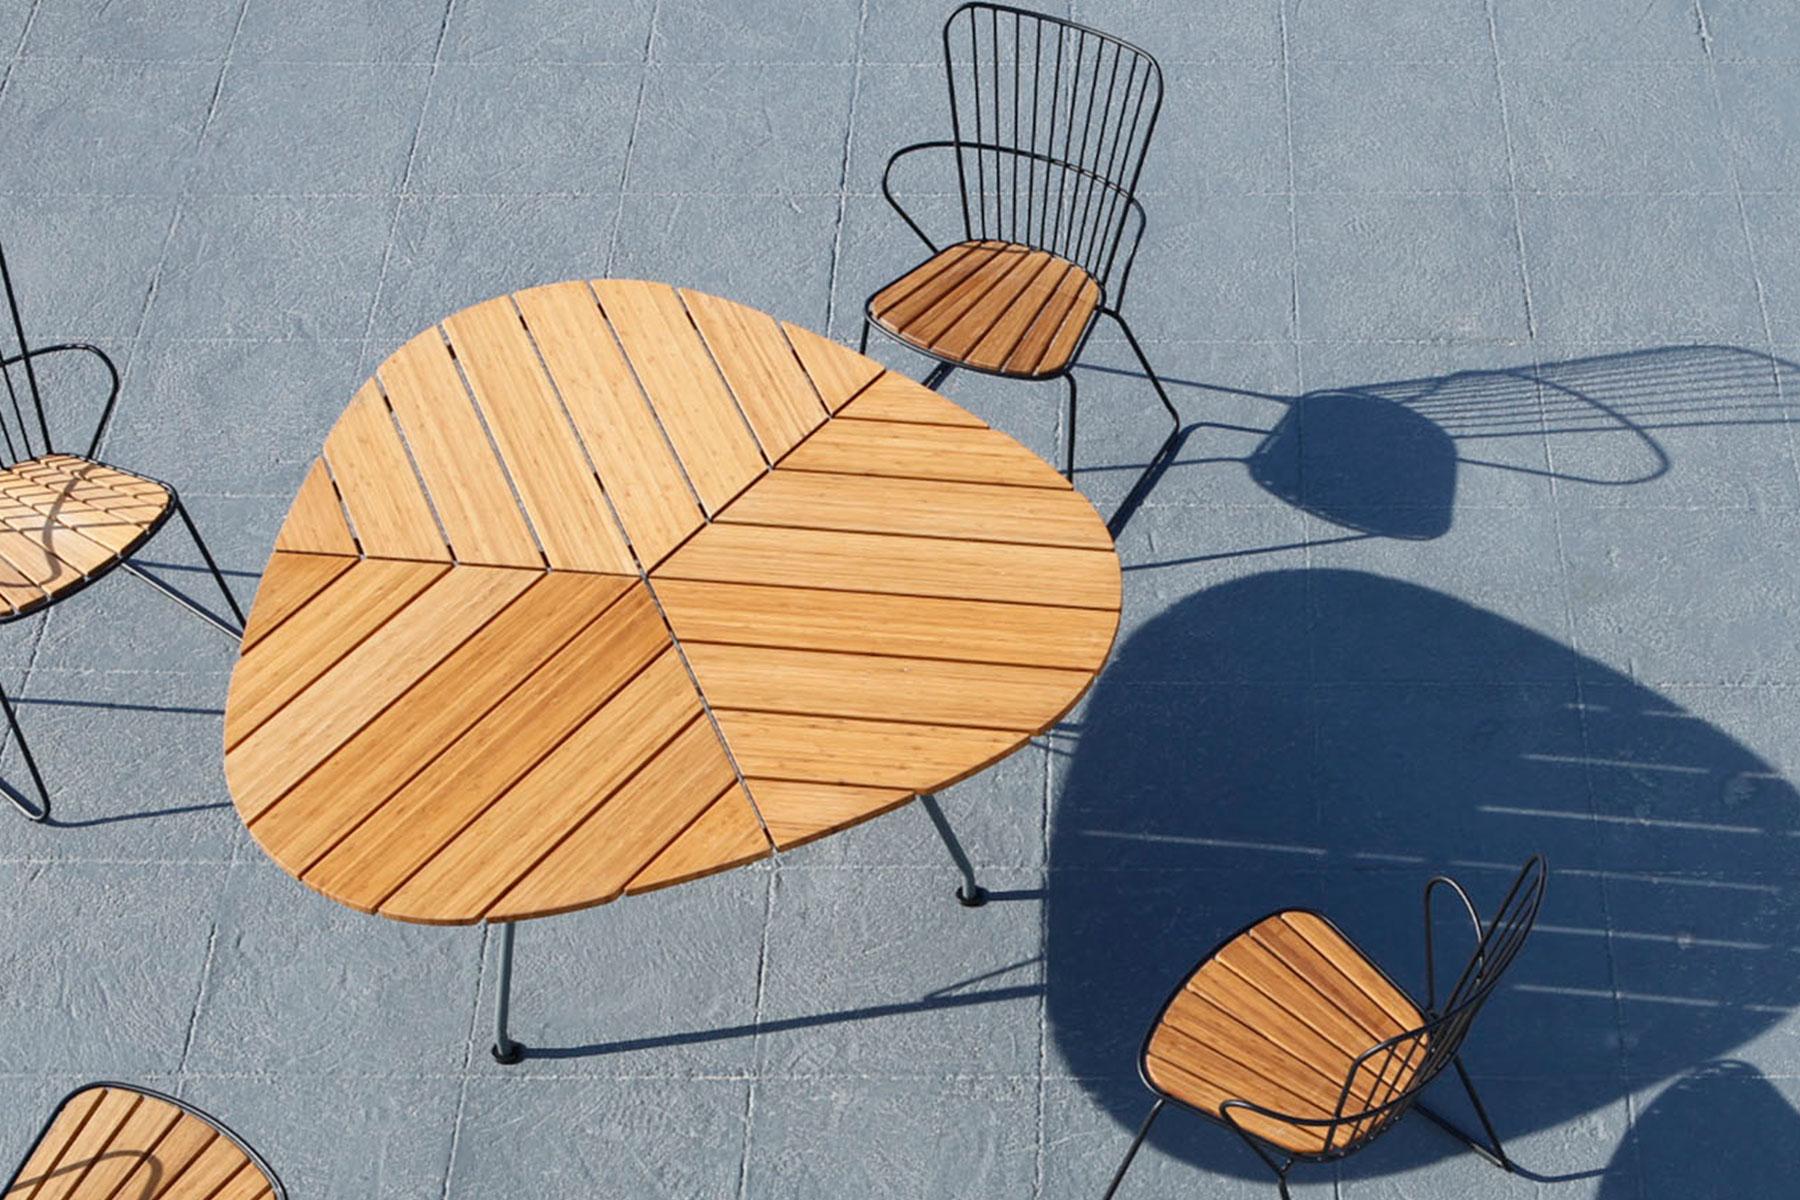 ©-Adam-Robinson-Design-Bamboo-Tables-The-HOUE-Collection-00.jpg